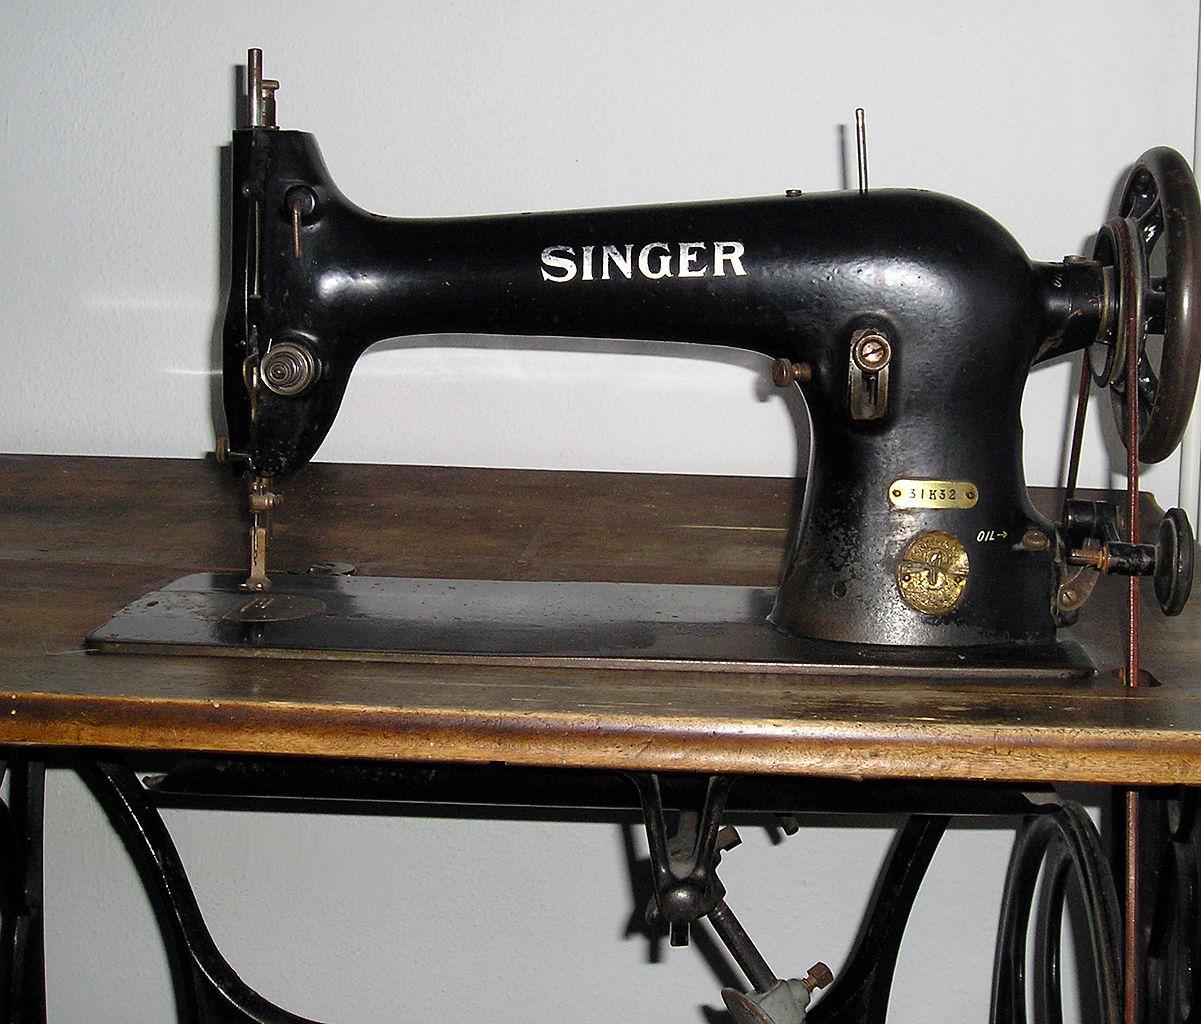 file singer sewing machine simple english. Black Bedroom Furniture Sets. Home Design Ideas